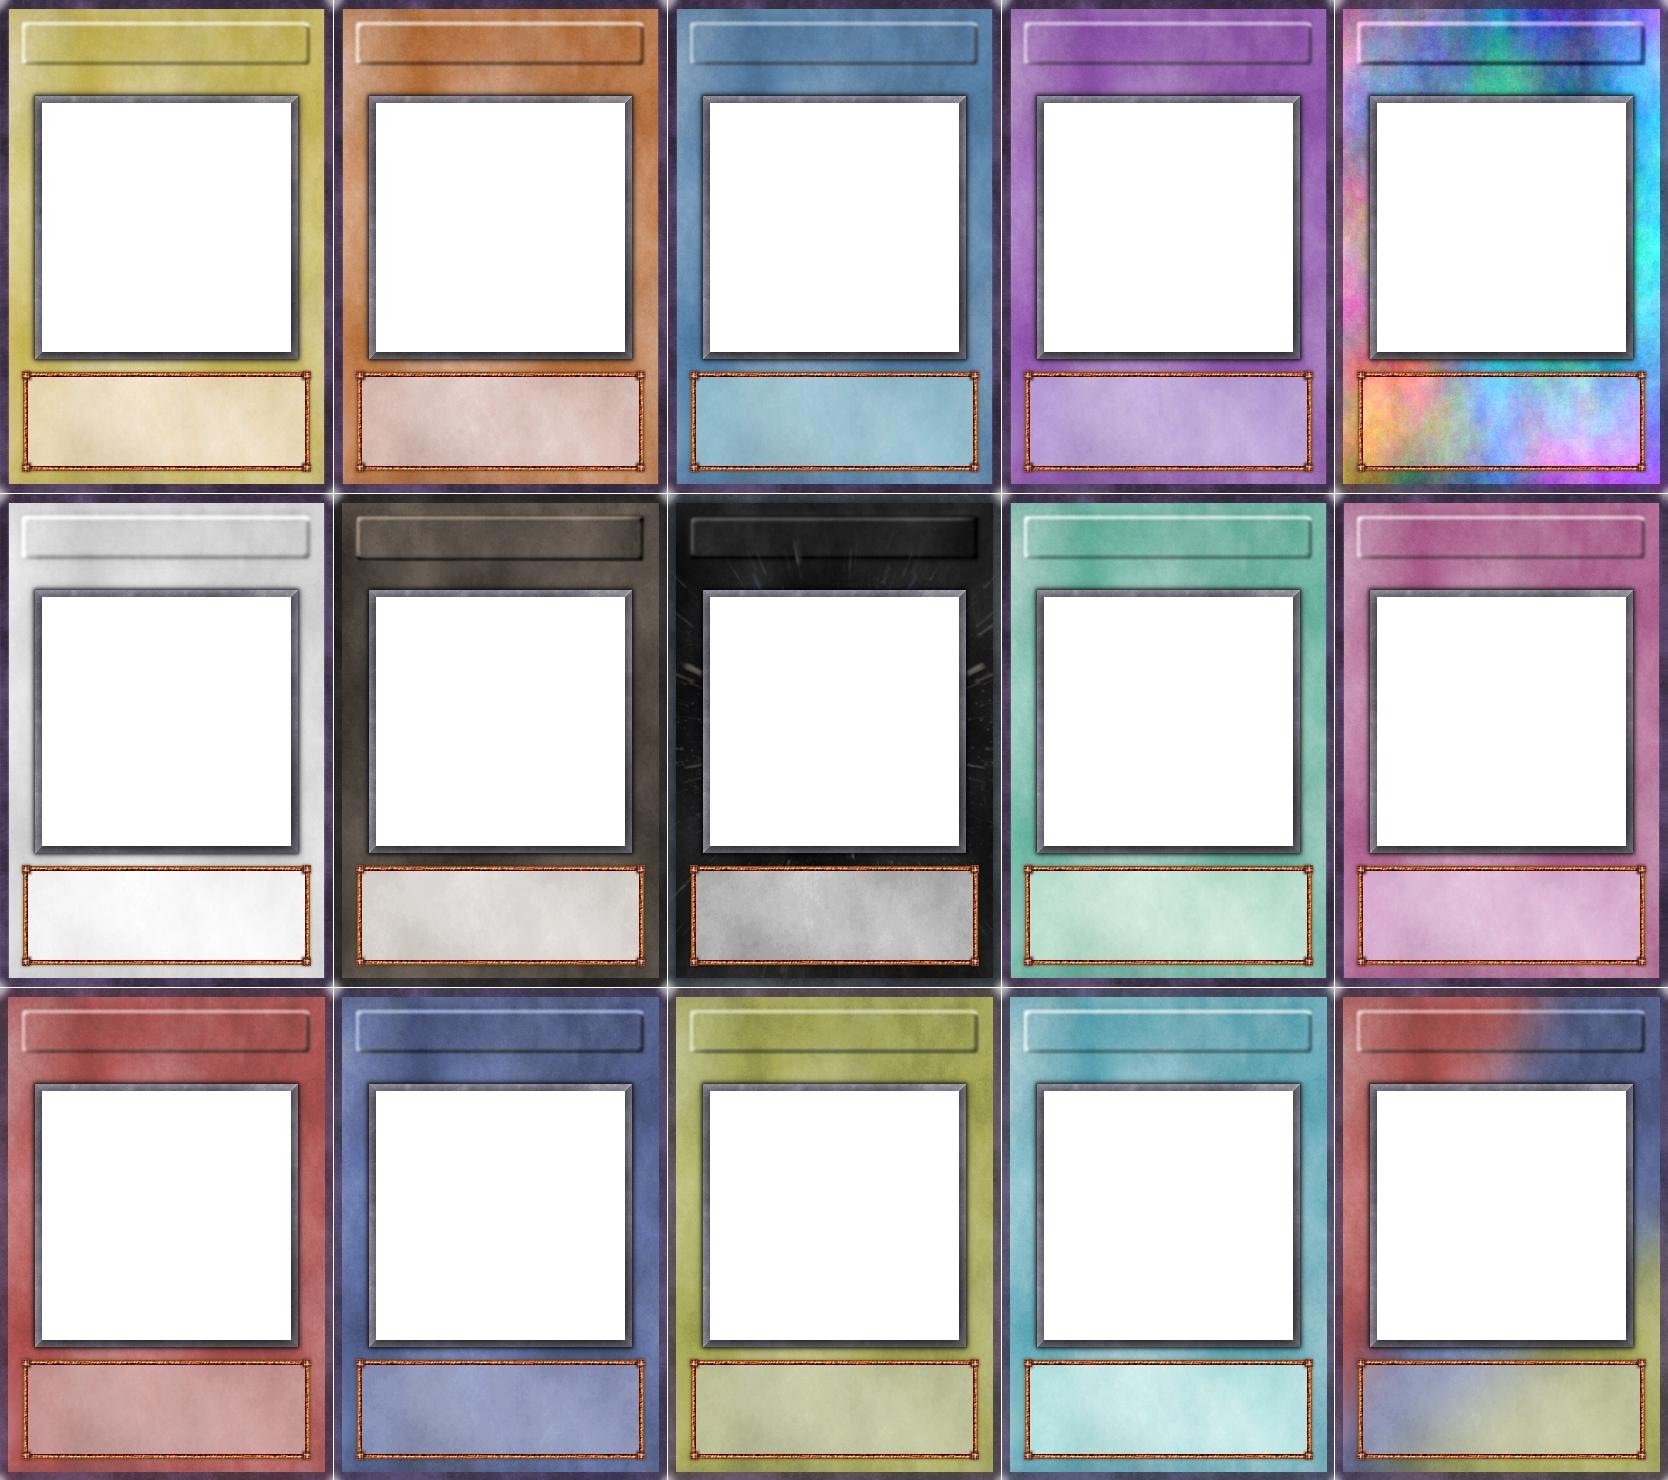 Trading Card Template Word Free Printable Pdf Psd Eps App Within With Trading Card Template Word